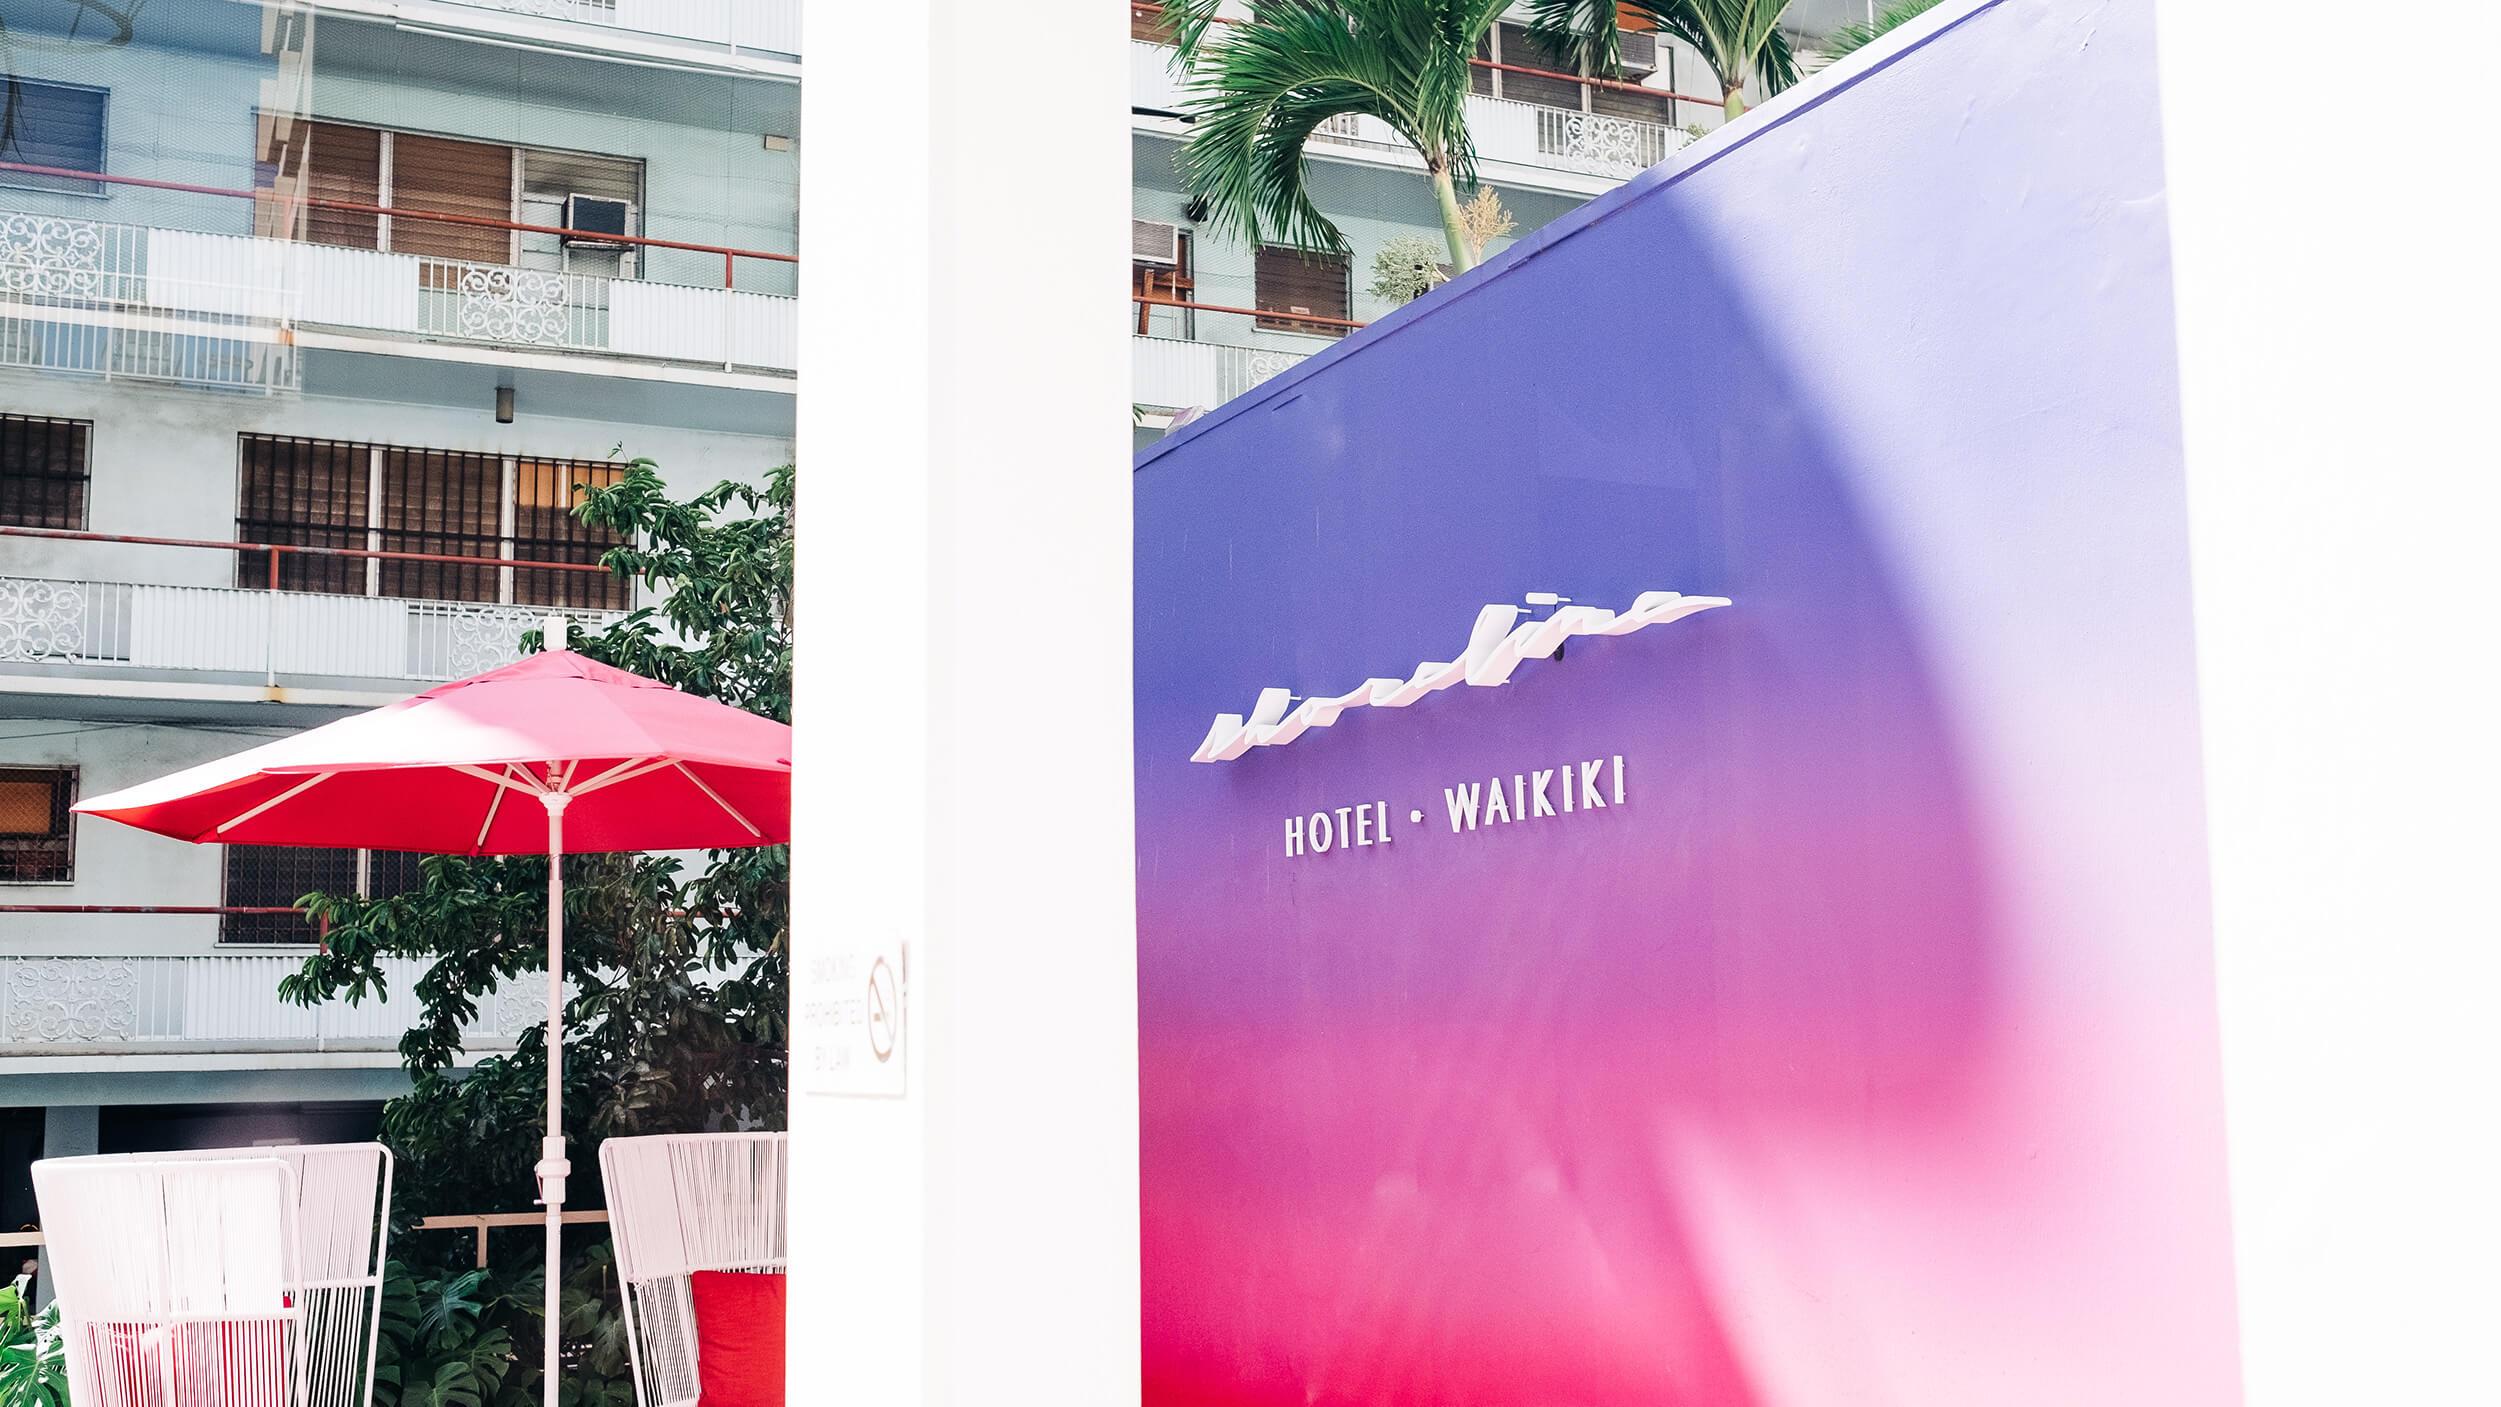 Keeping Hawaii Beautiful With Shoreline Hotel Waikiki